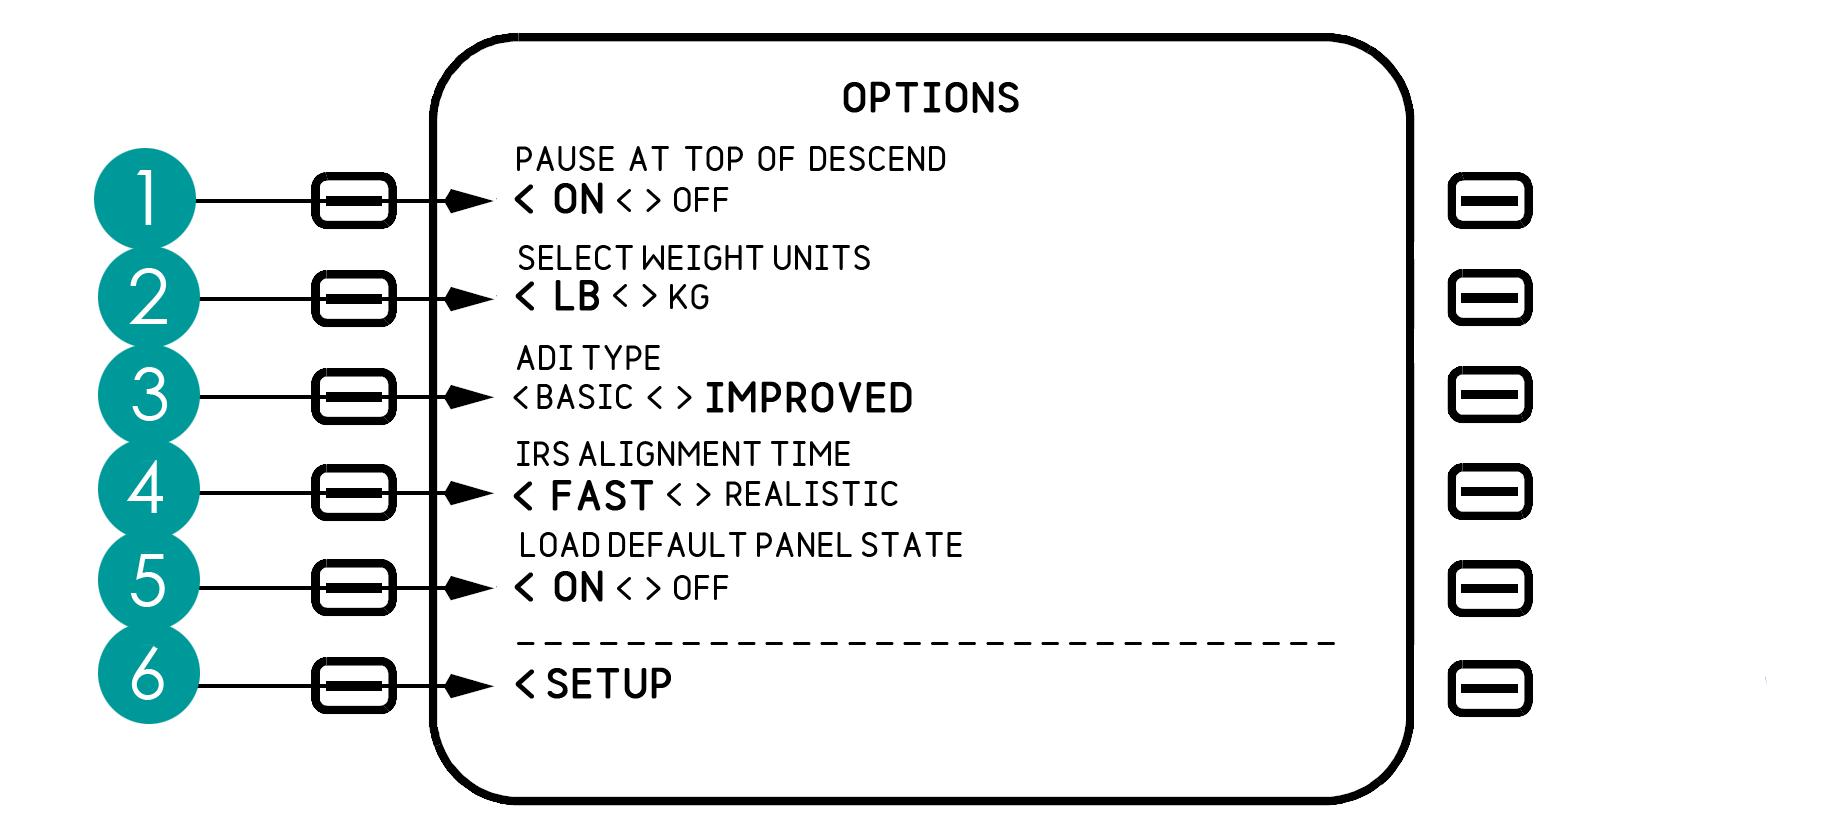 P1_3-OPTIONS.png